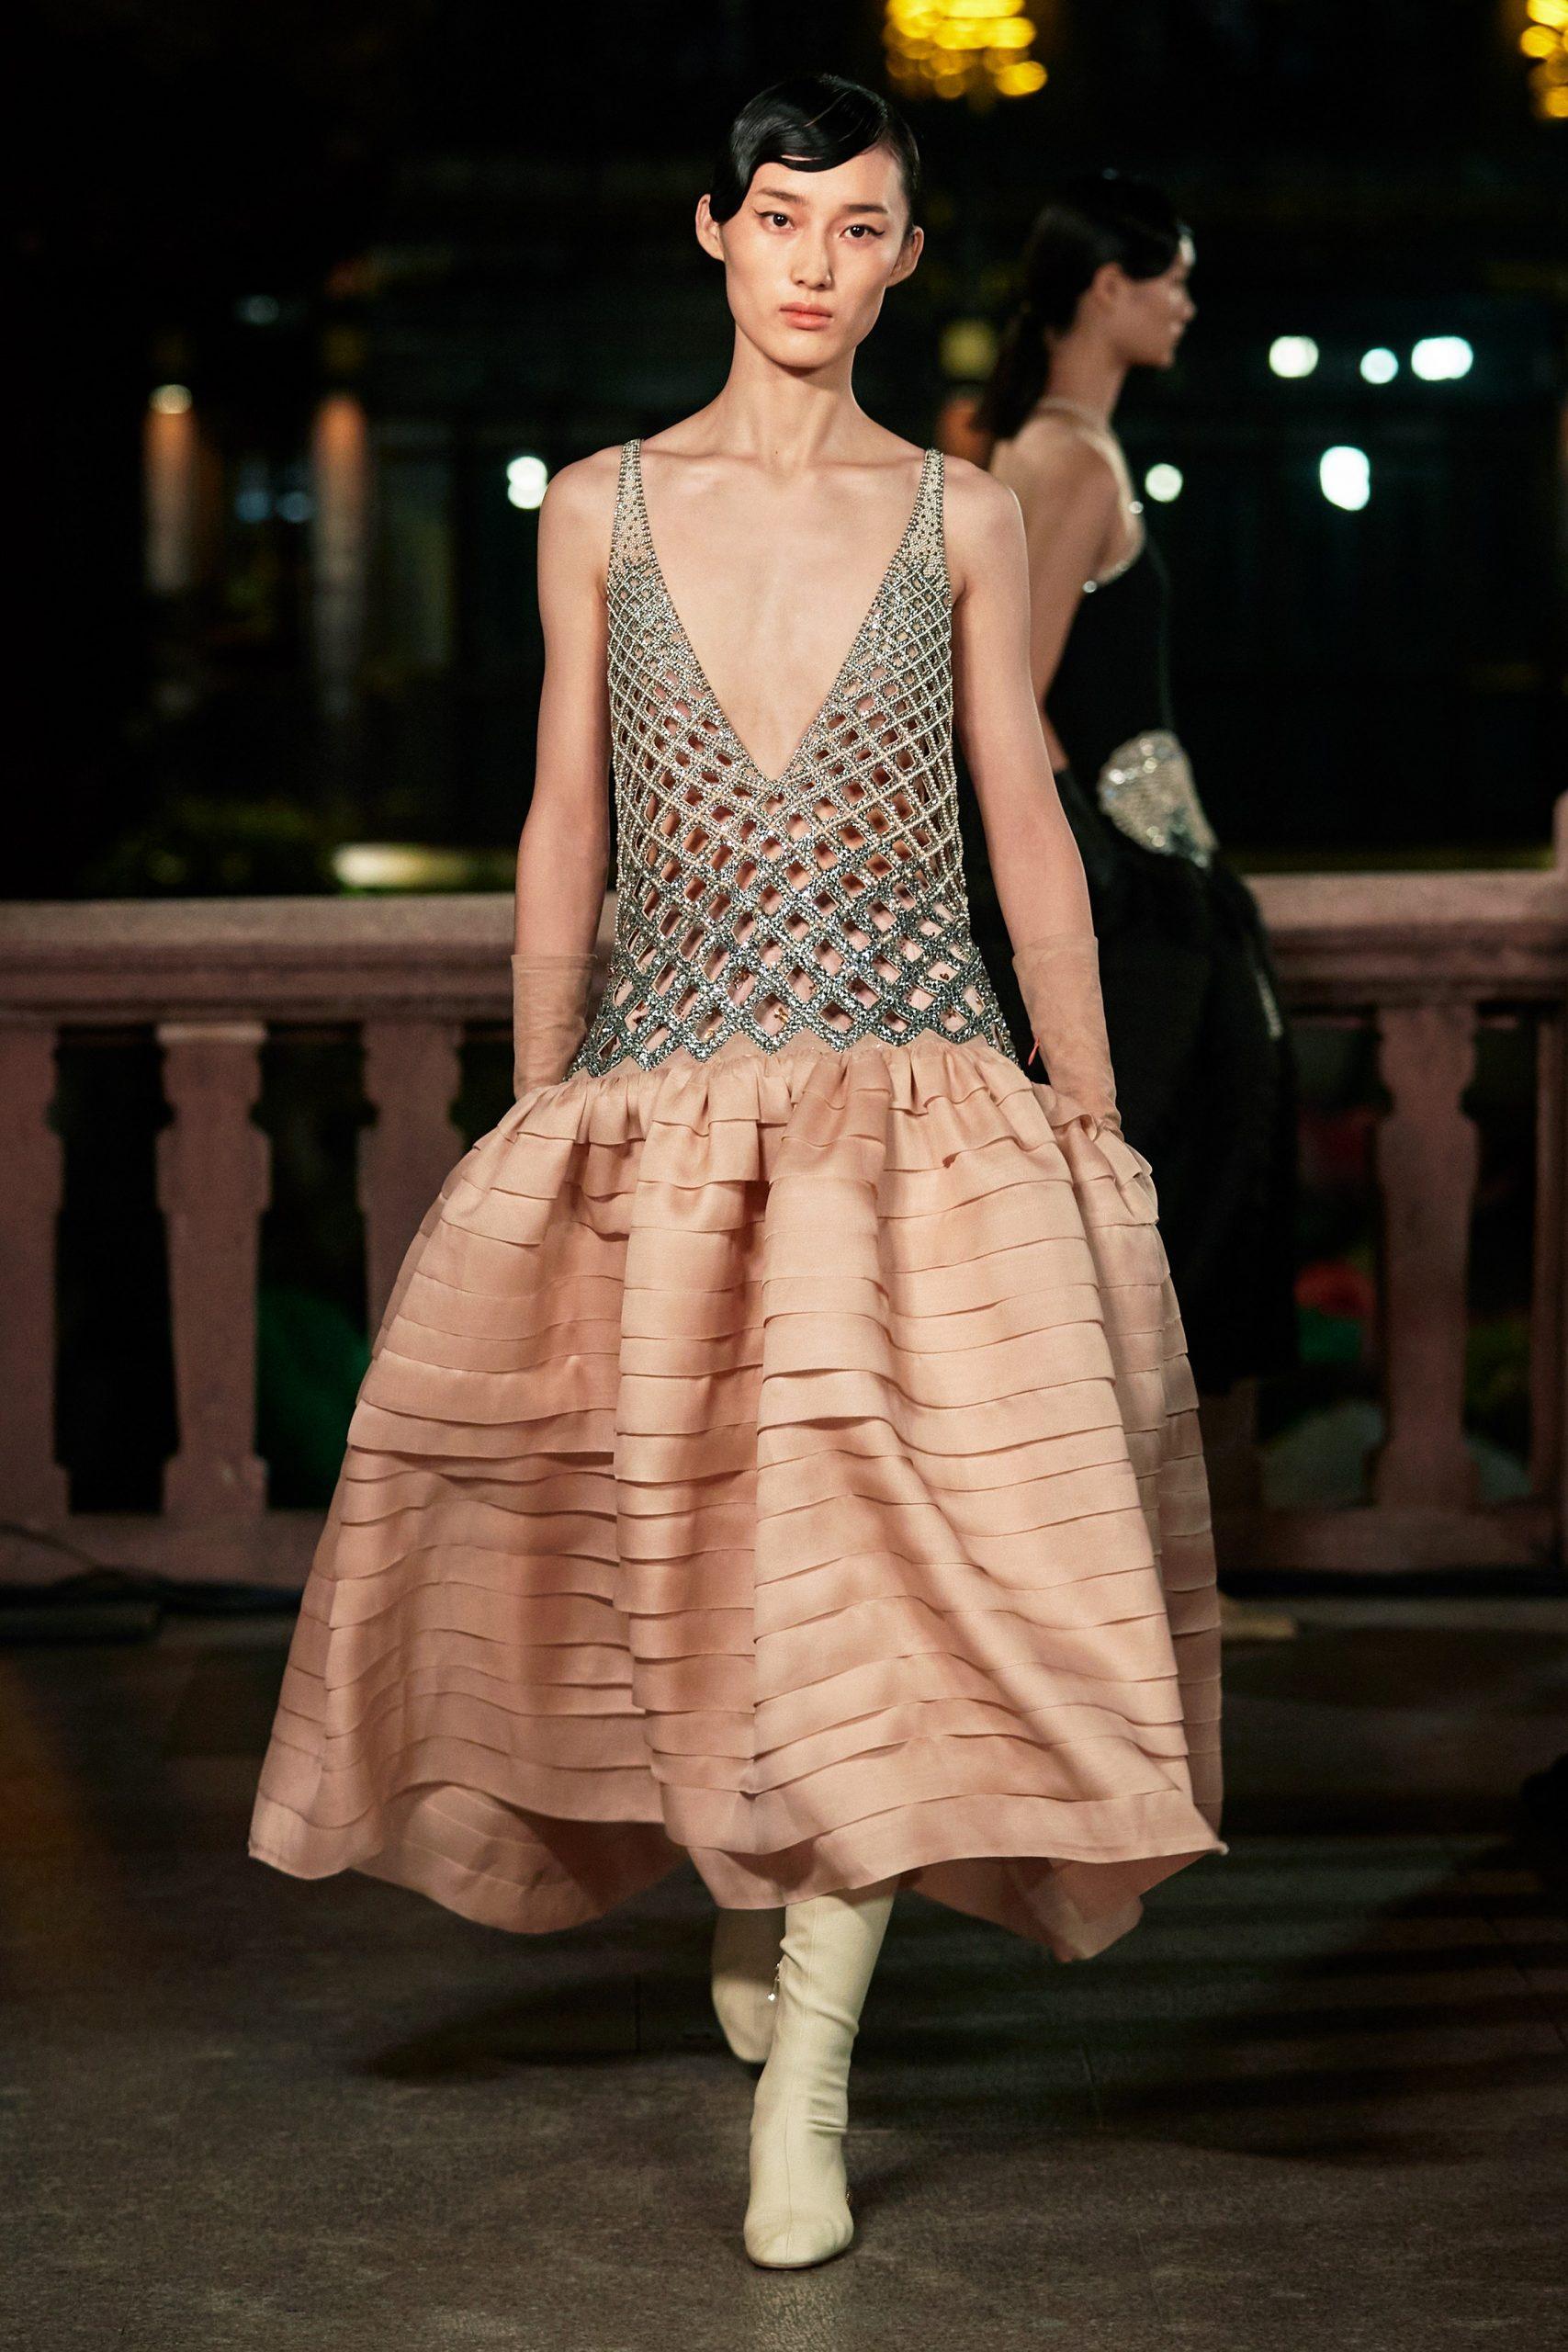 Lanvin Spring 2021 Fashion Show Review